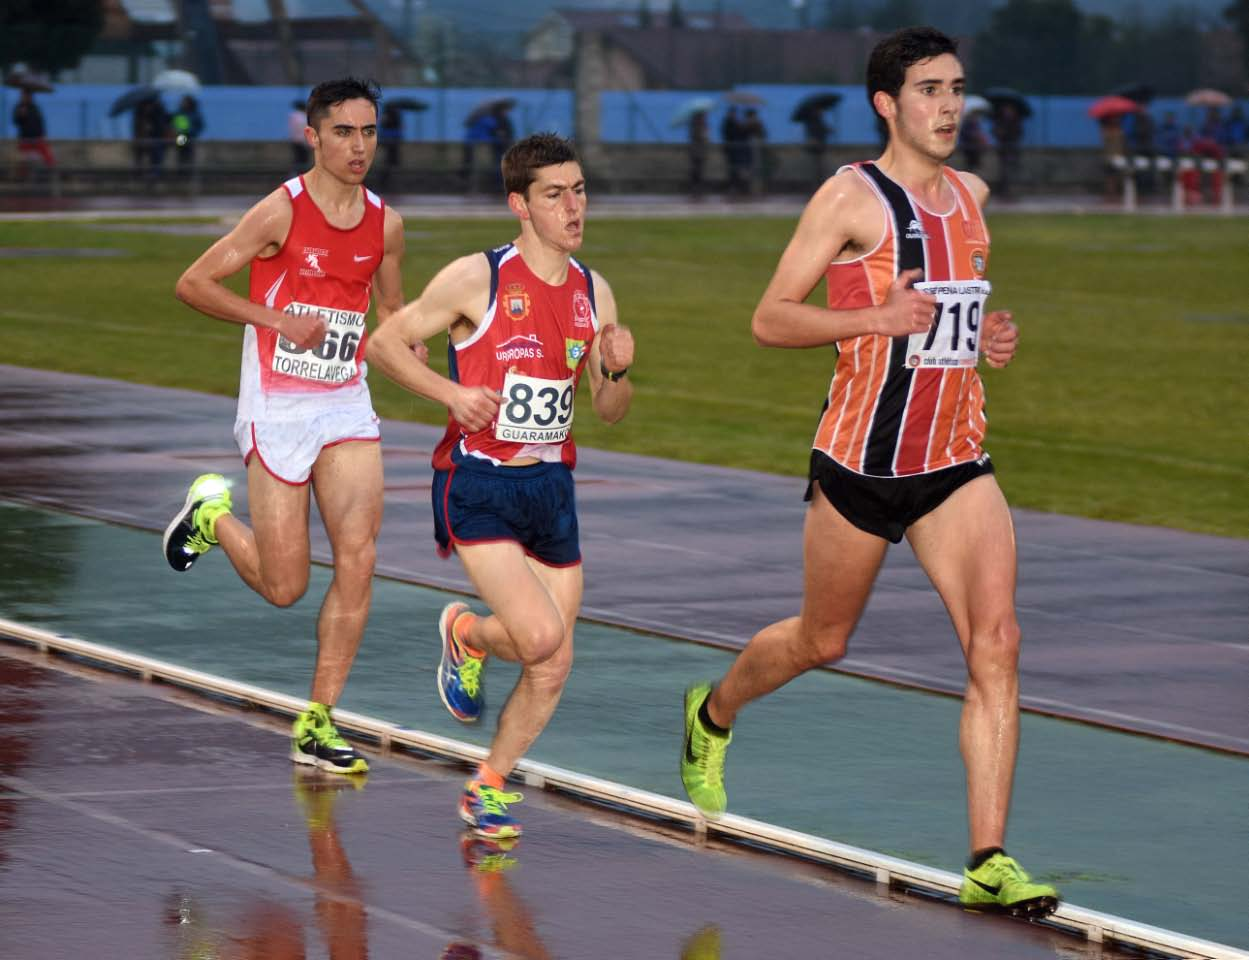 25-3 Santiago Cobo 10000